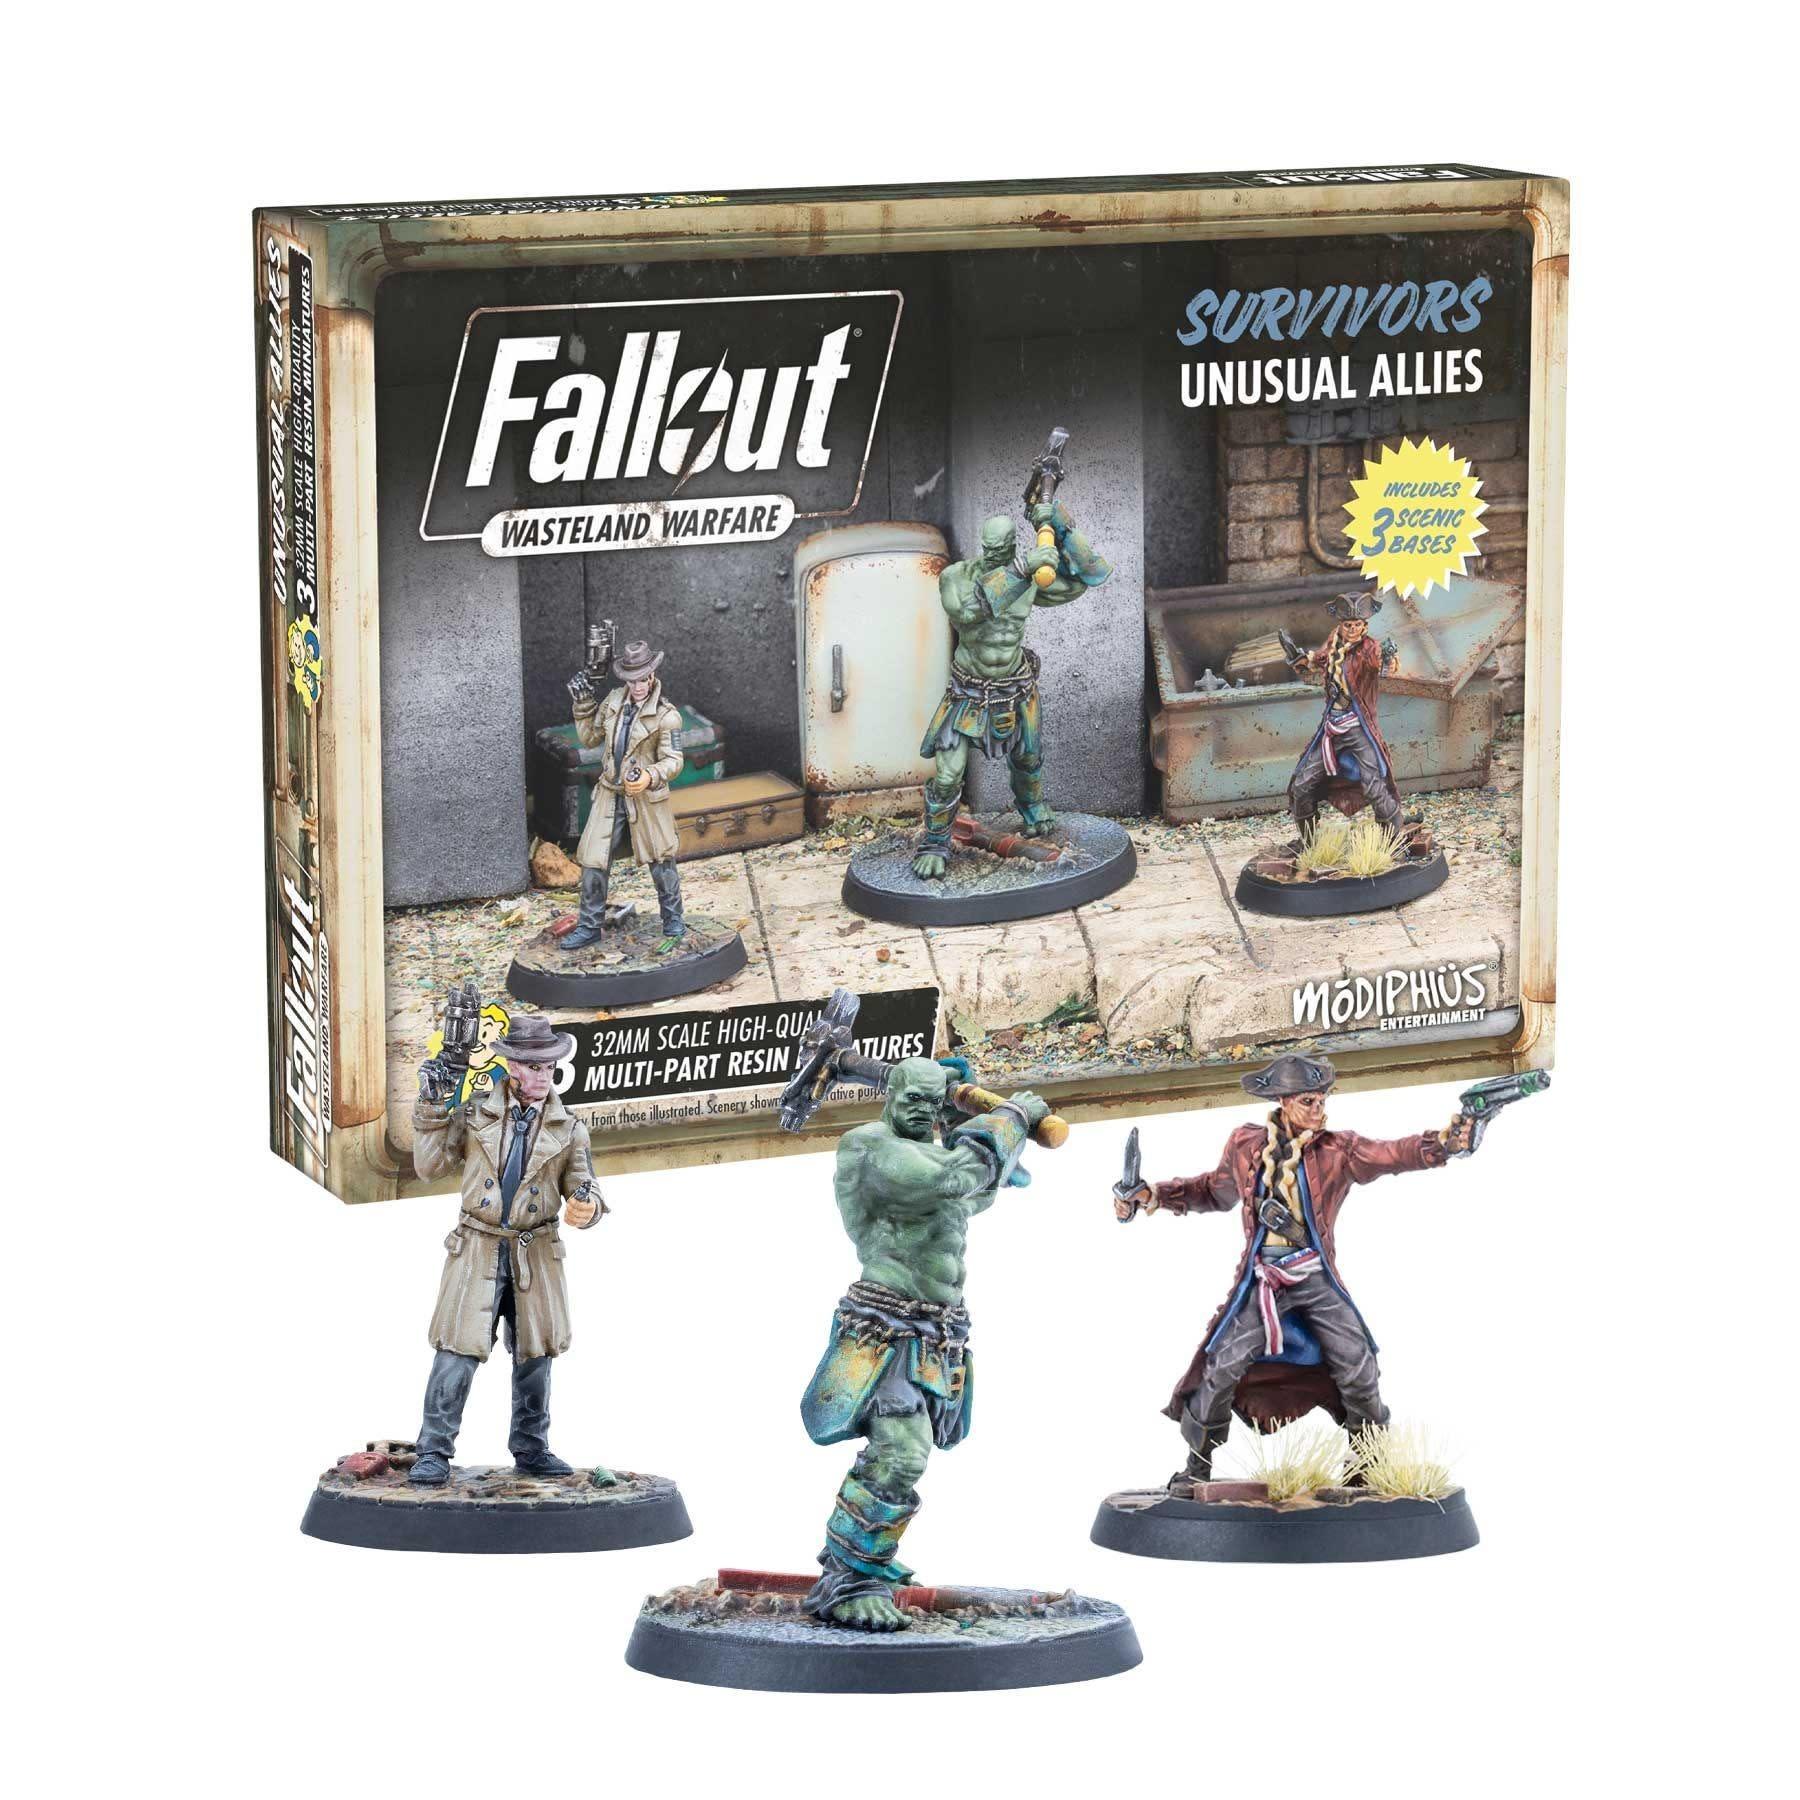 Modiphius Fallout Wasteland Warfare: Survivors- Unusual Allies